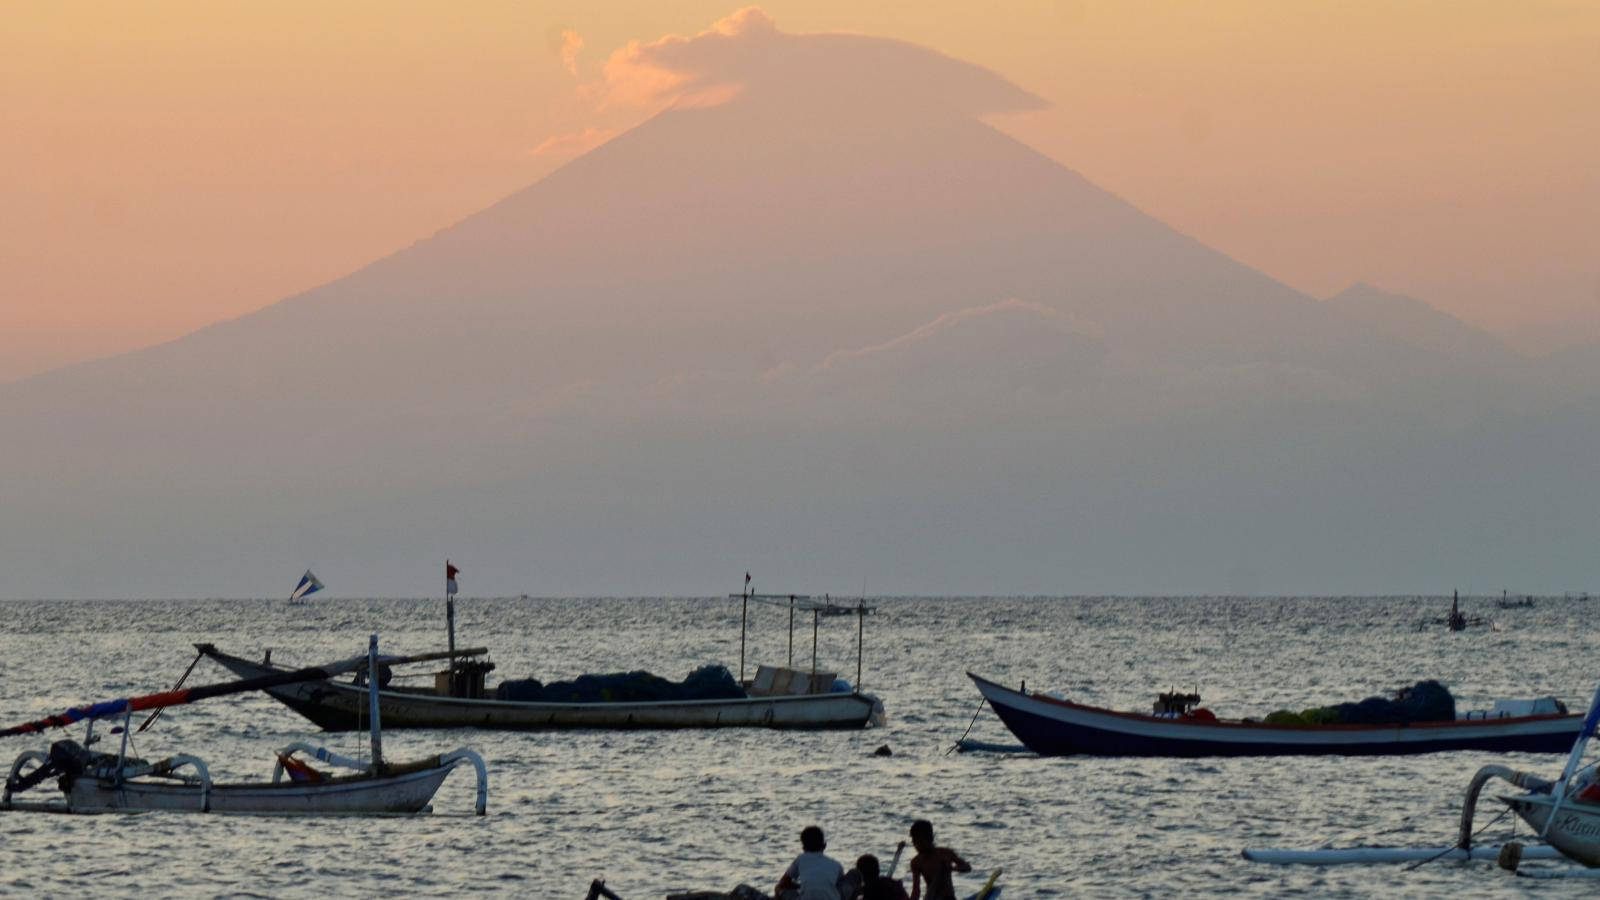 Na Bali se probudila sopka Agung